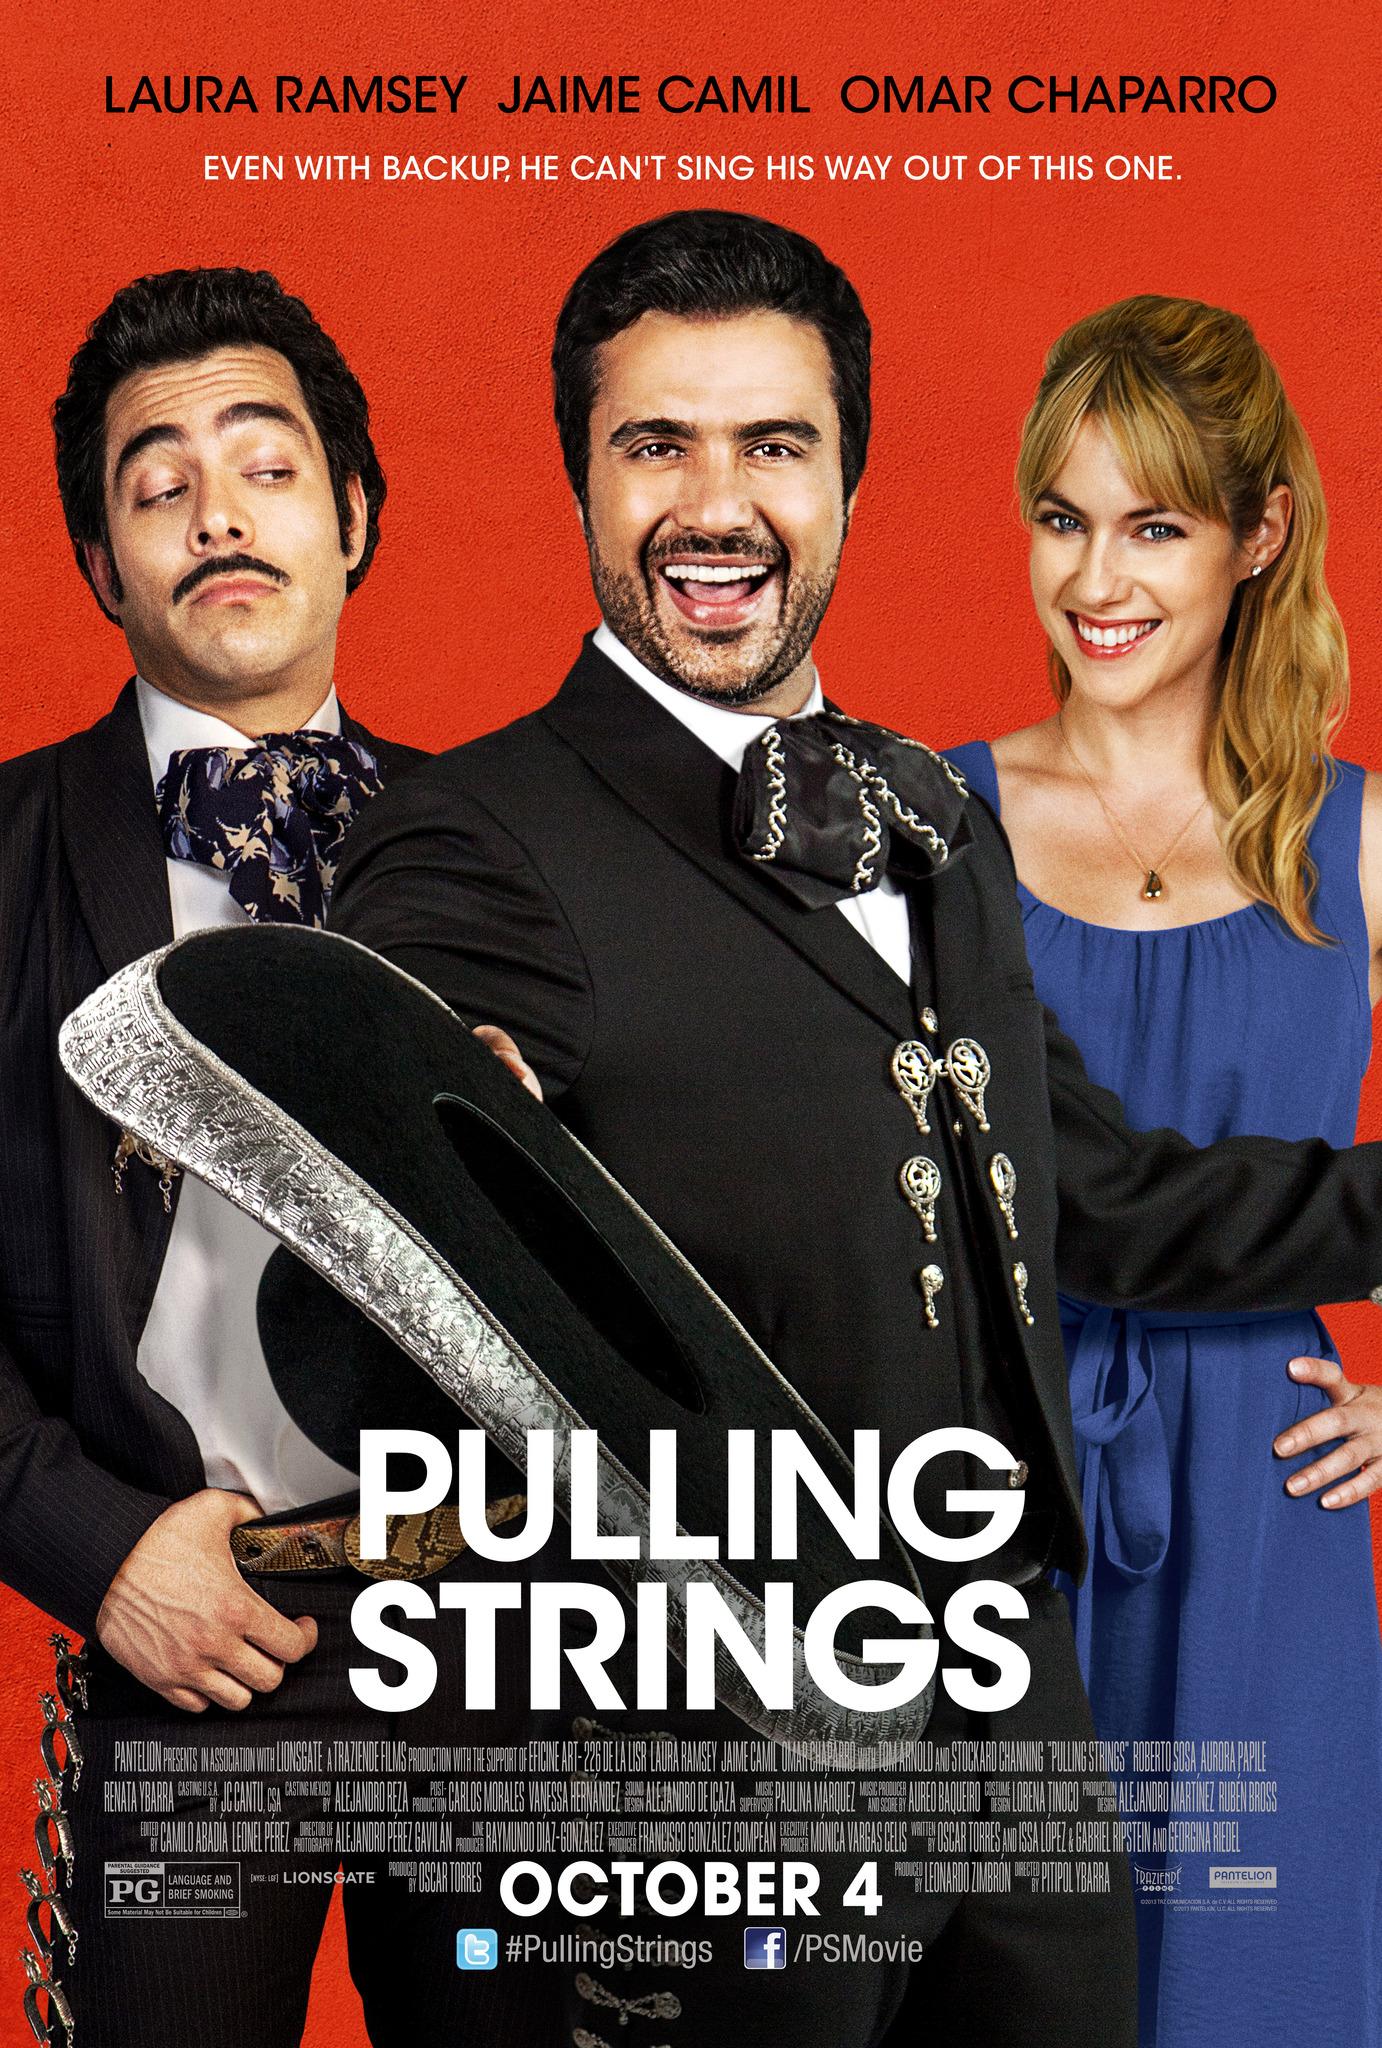 Pulling Strings 2013 Imdb